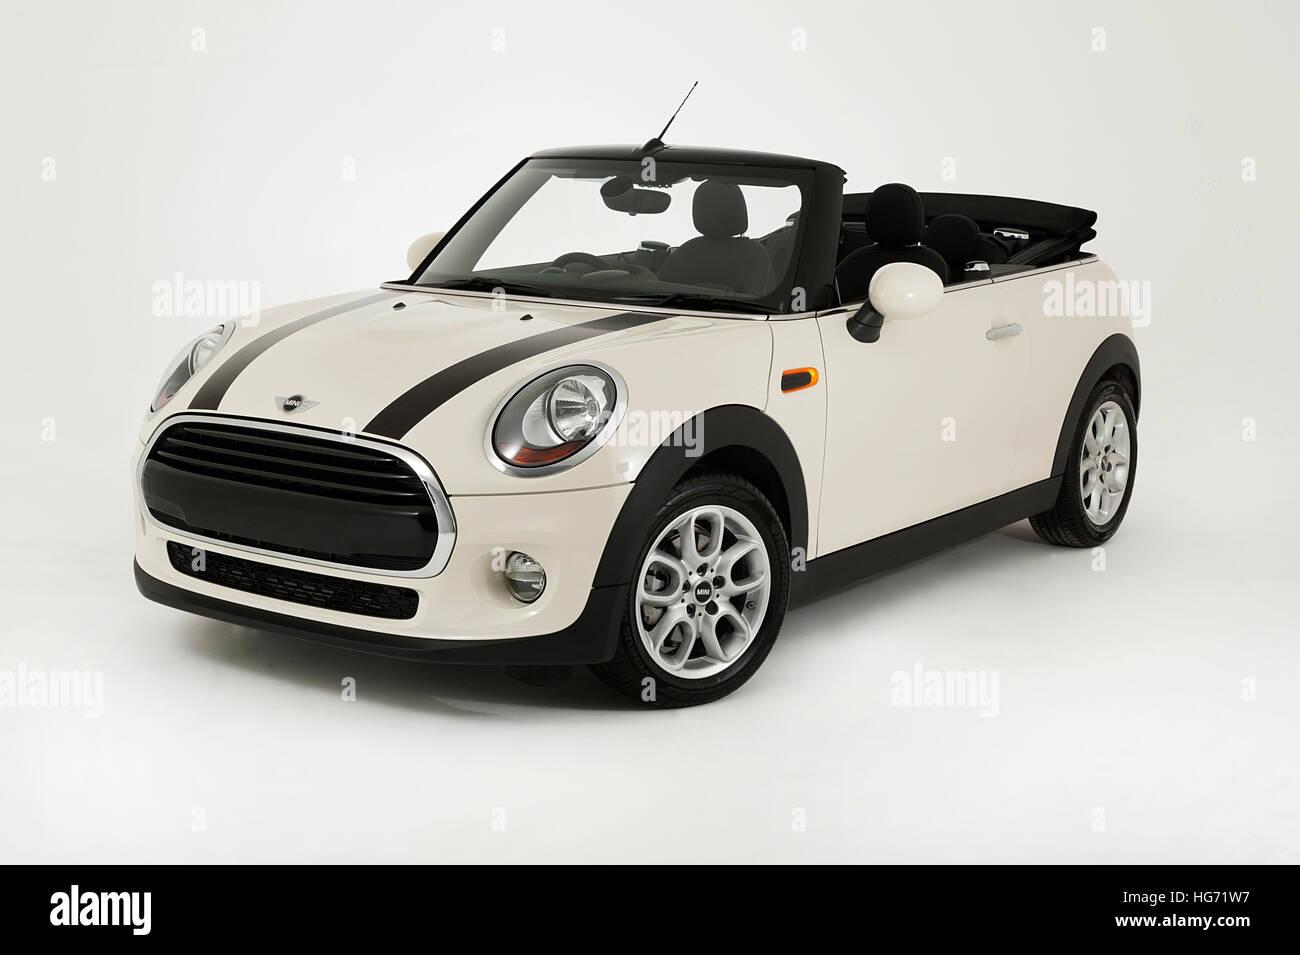 2017 Mini Cooper CABRIOLET Immagini Stock